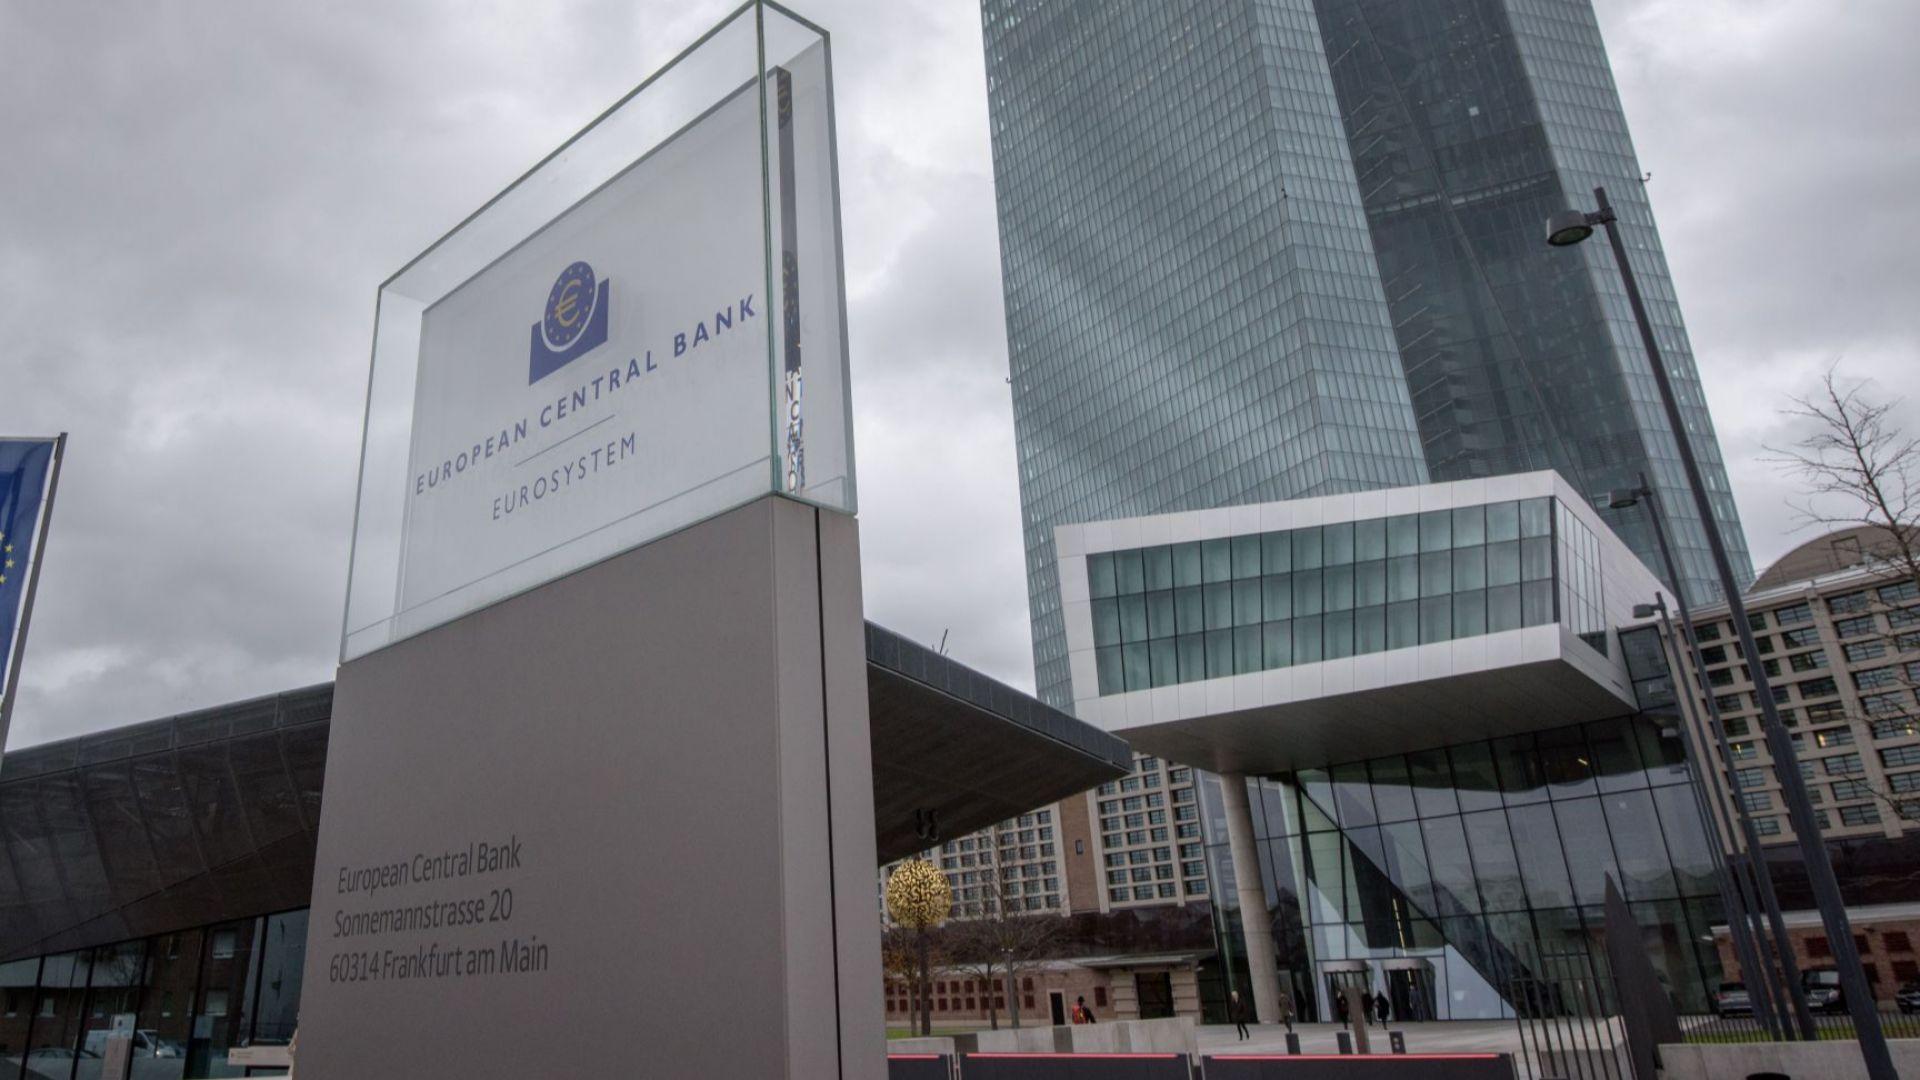 ЕЦБ увеличи печалбата си до 1.6 млрд. евро